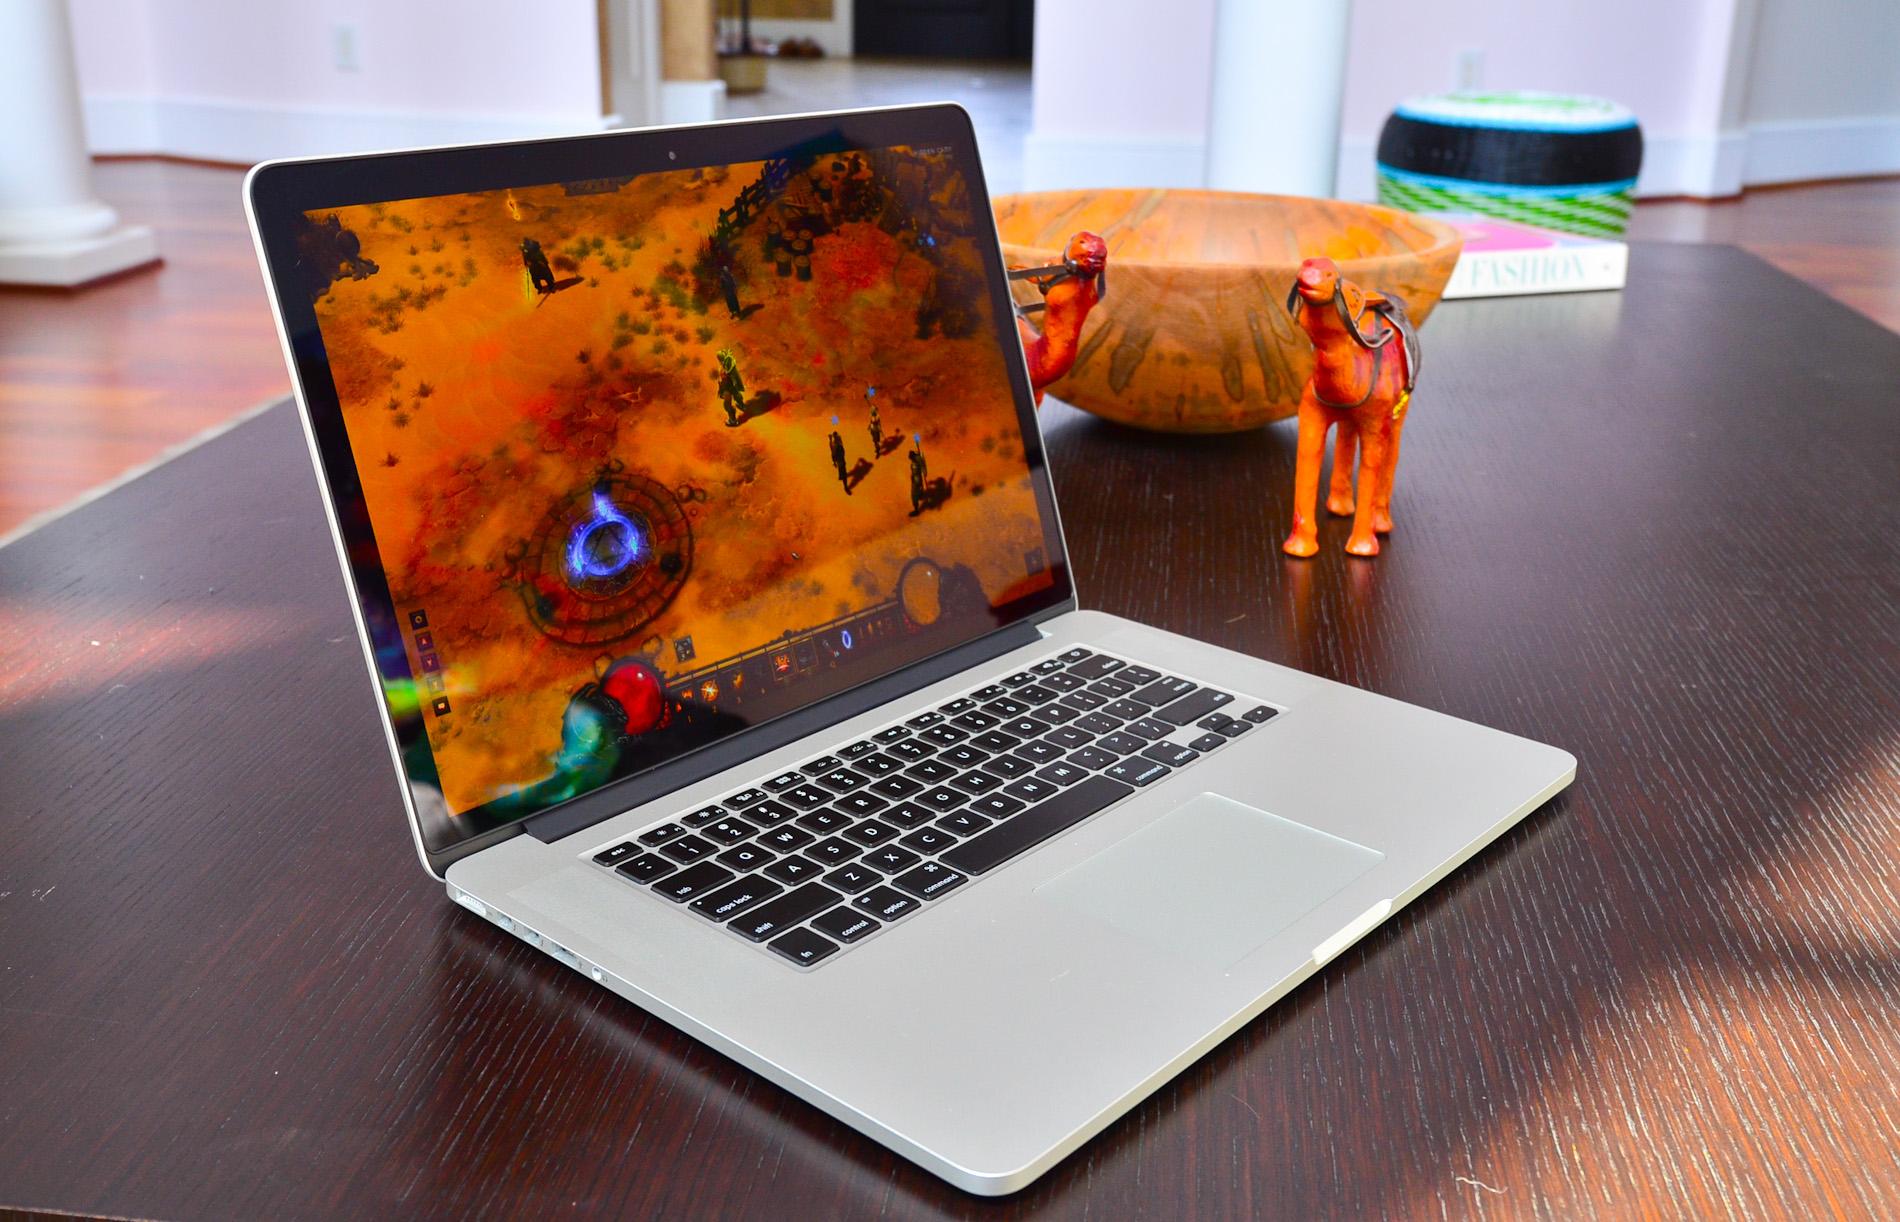 Resolution 15 high macbook inch pro